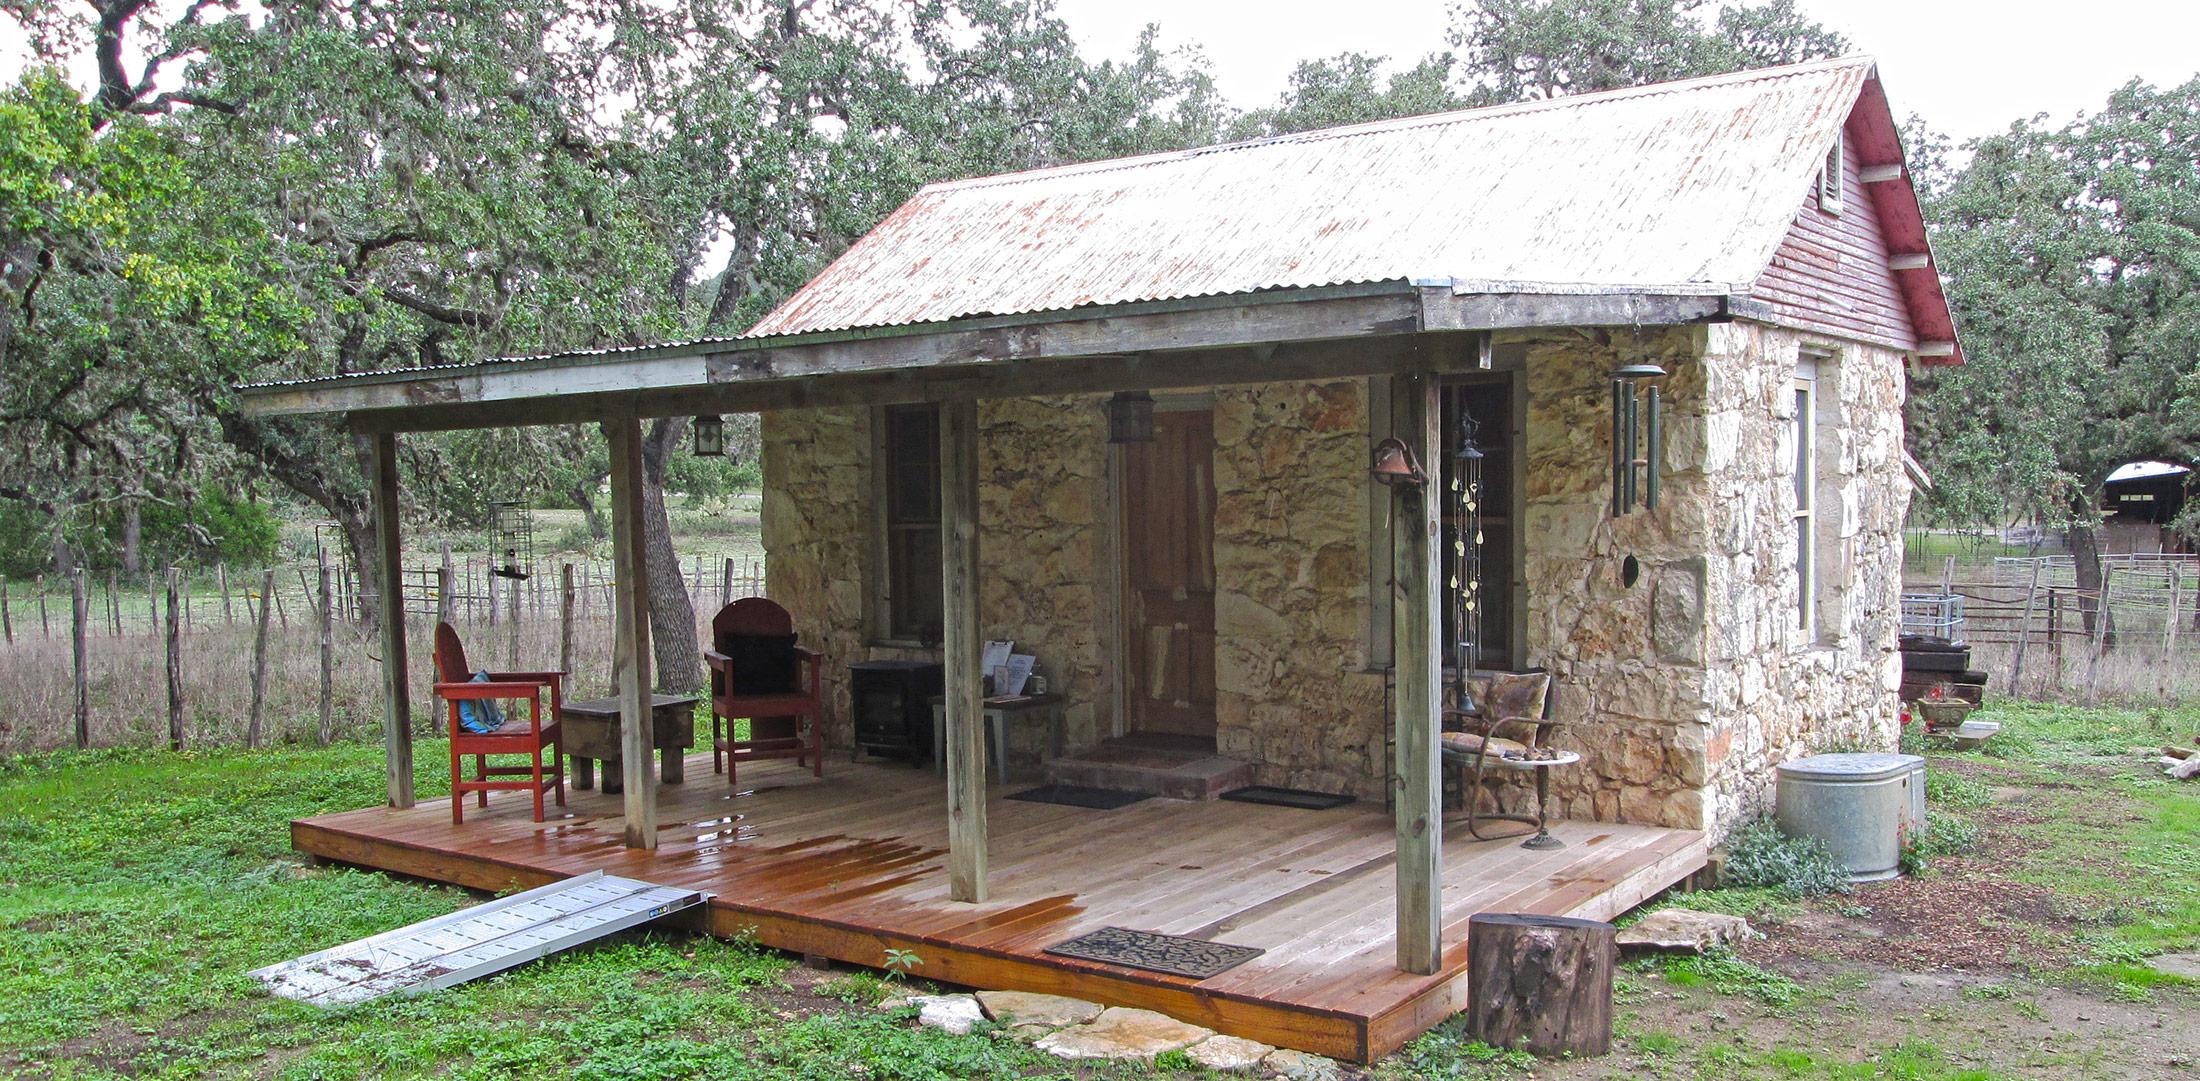 The Lodge - Menger Cottages - San Antonio Texas